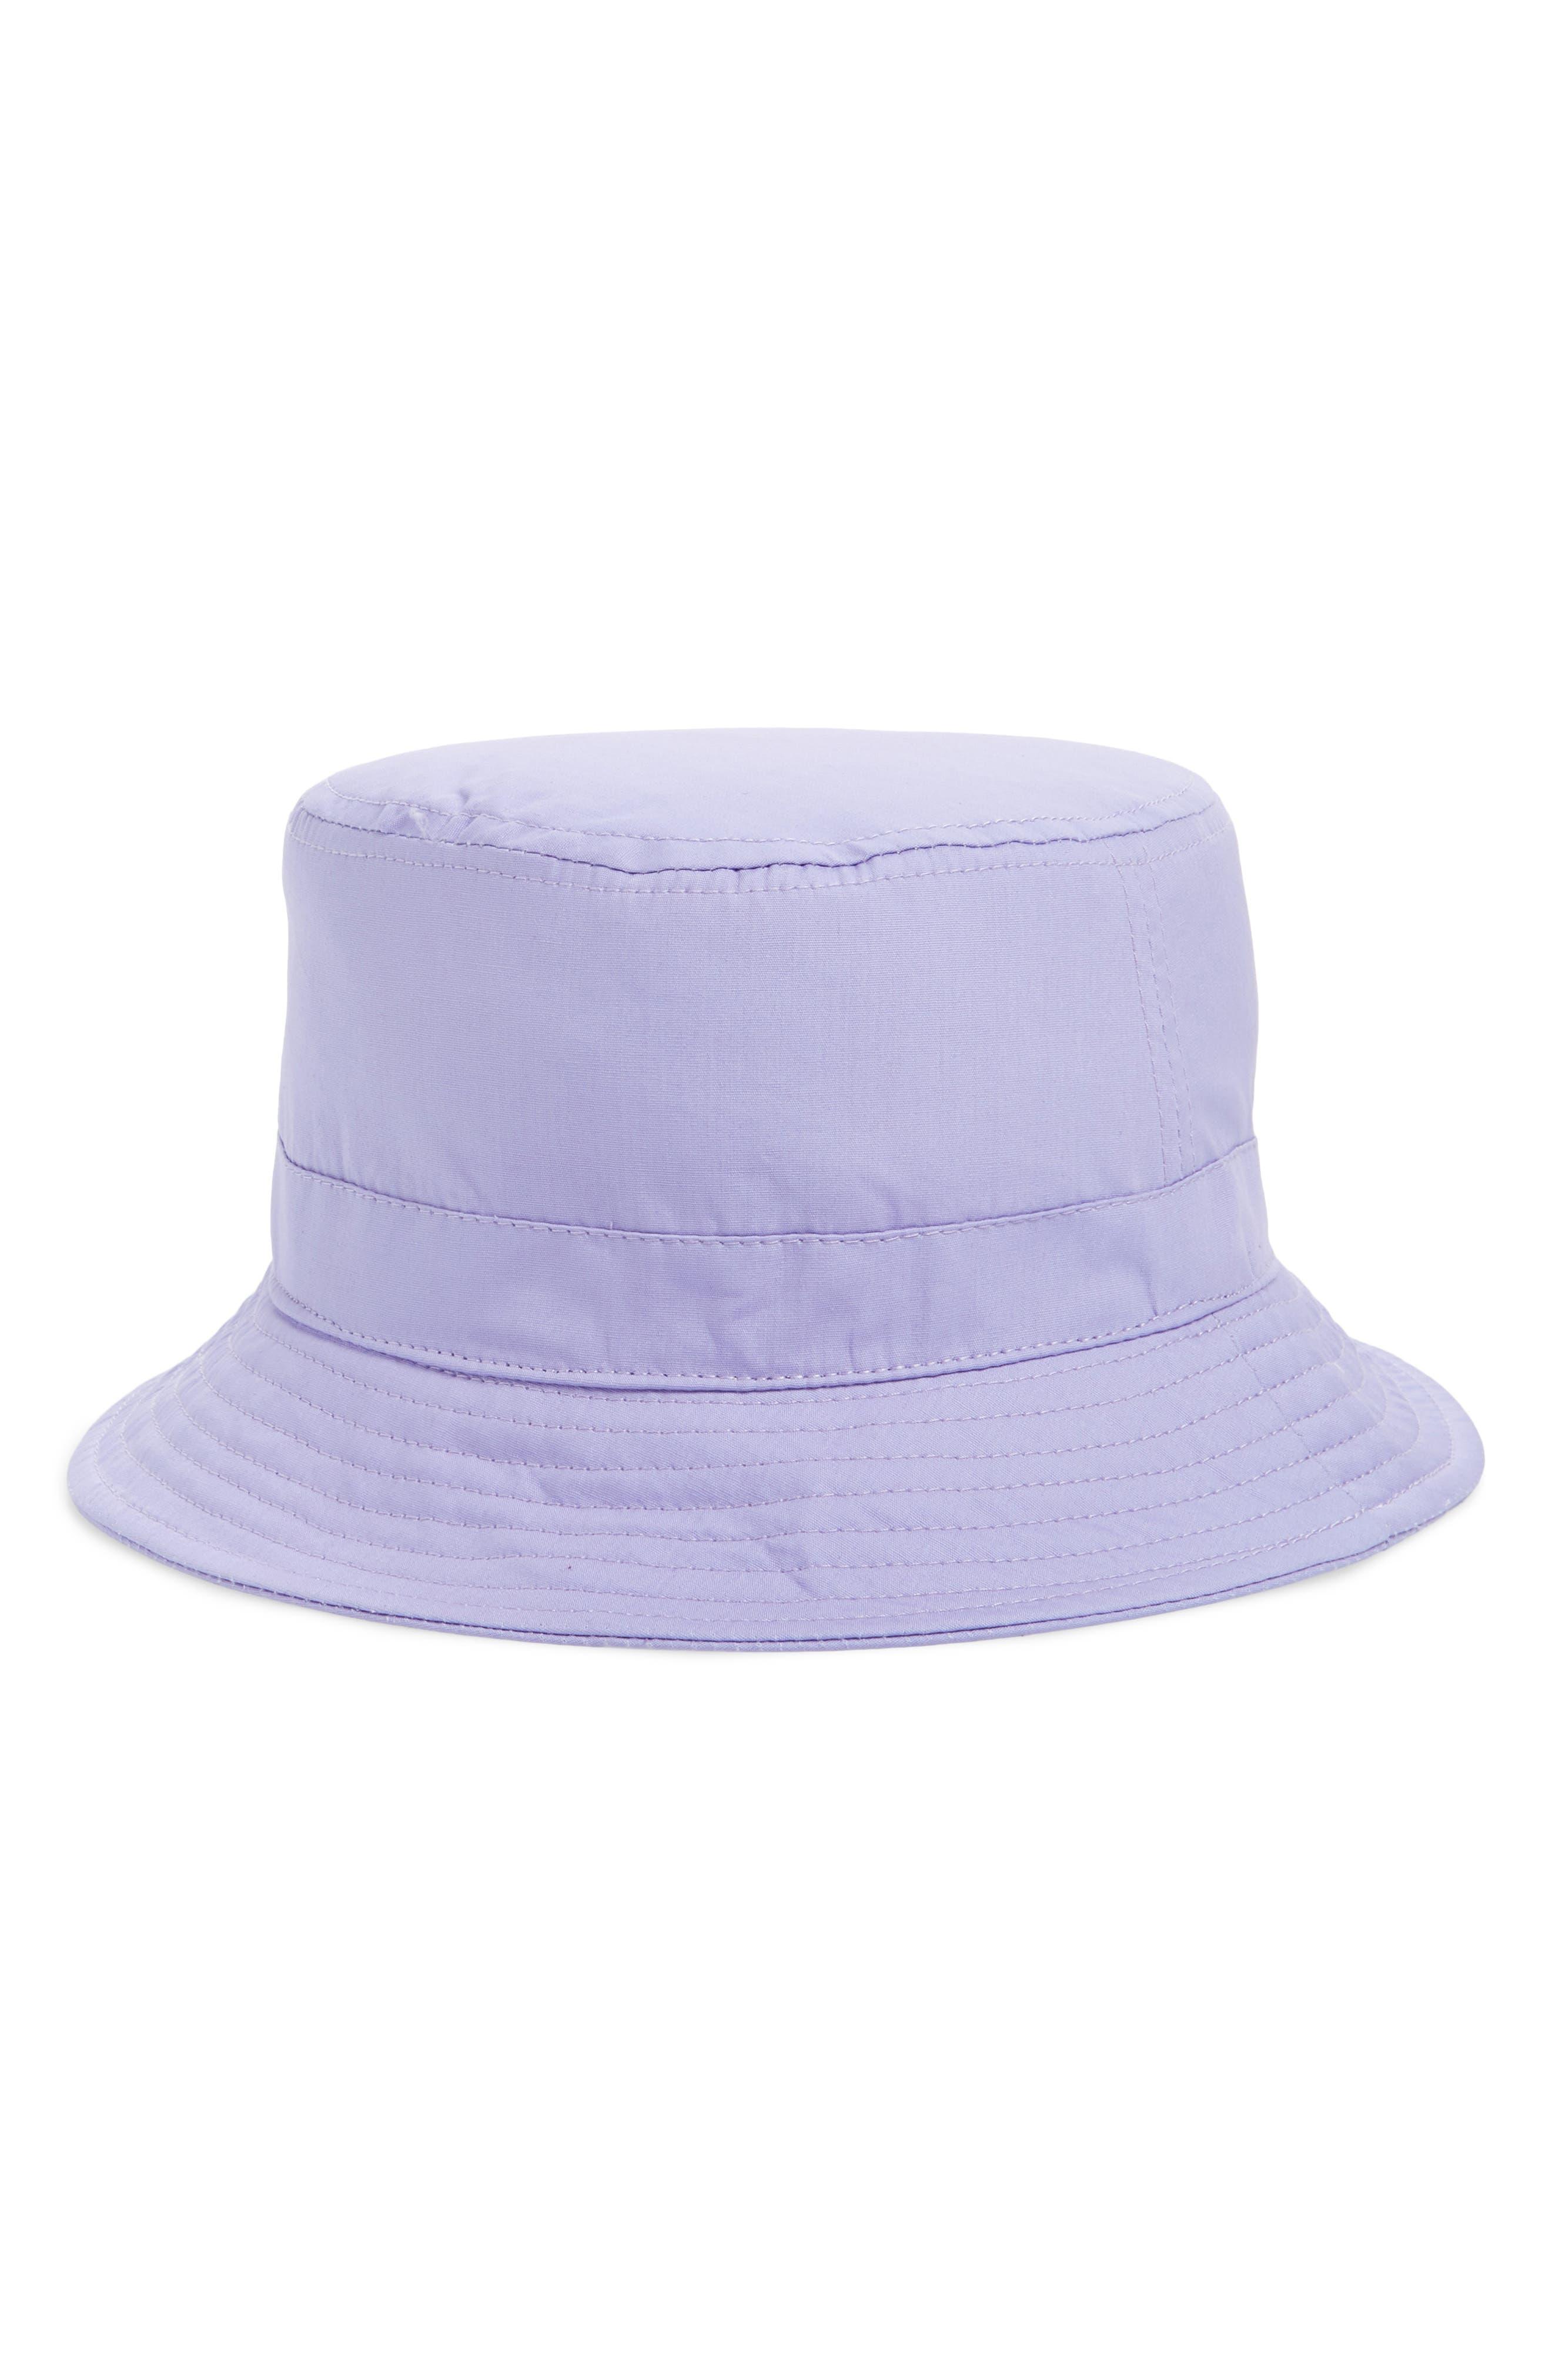 7dfeeaf86073a Women s Trouvé Clothing